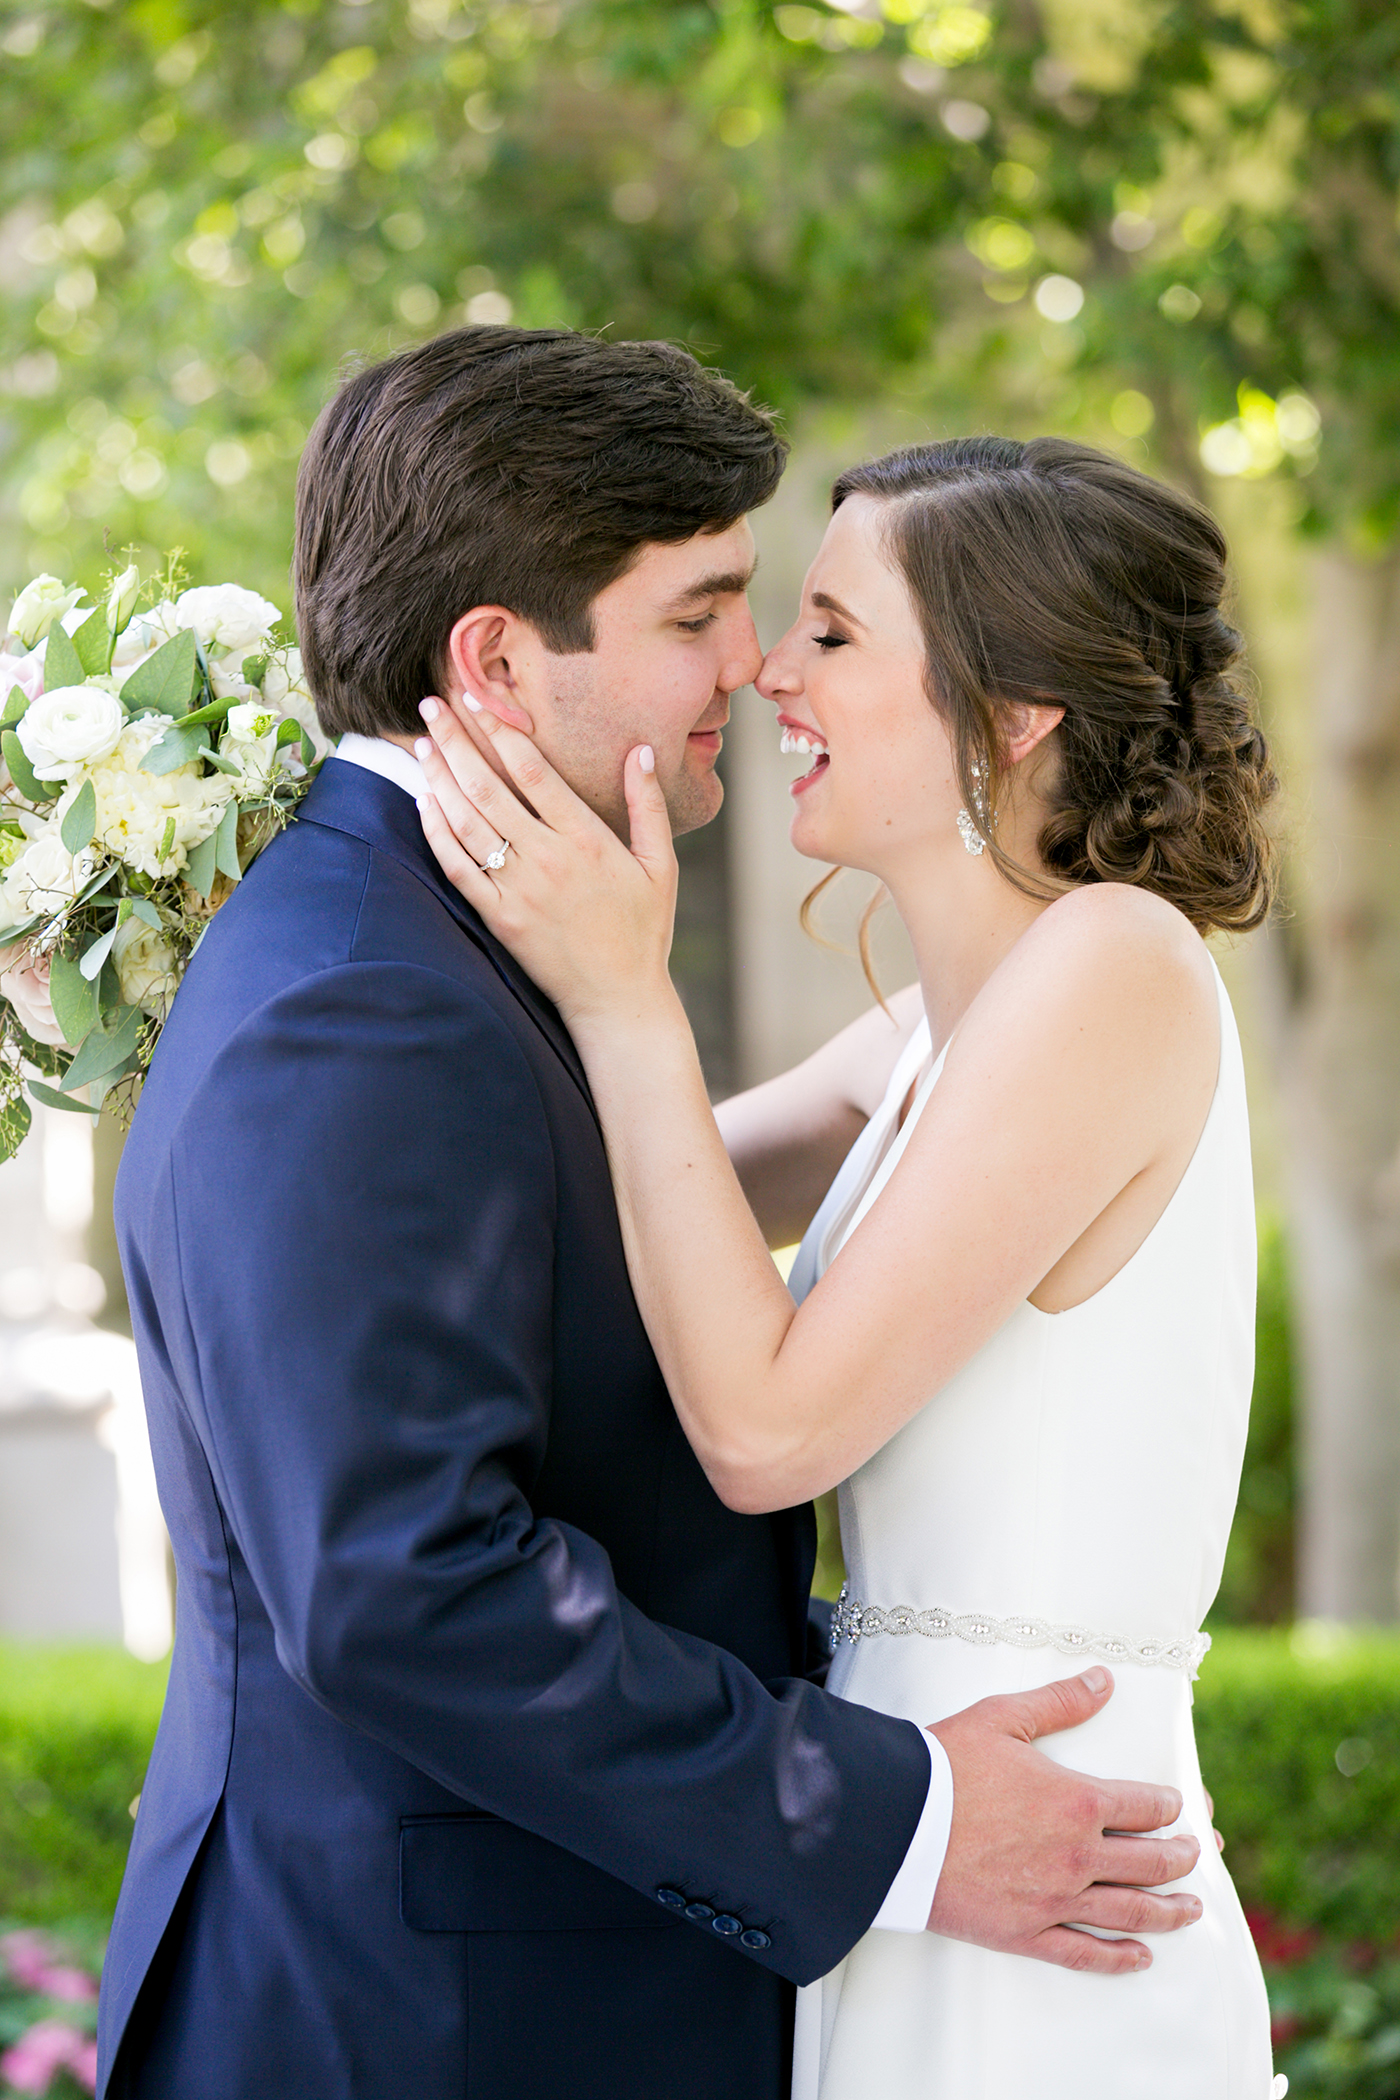 Wedding Planner Dallas TX - Allday Events - Highland Park - Marie Gabrielle Wedding - 187.jpg